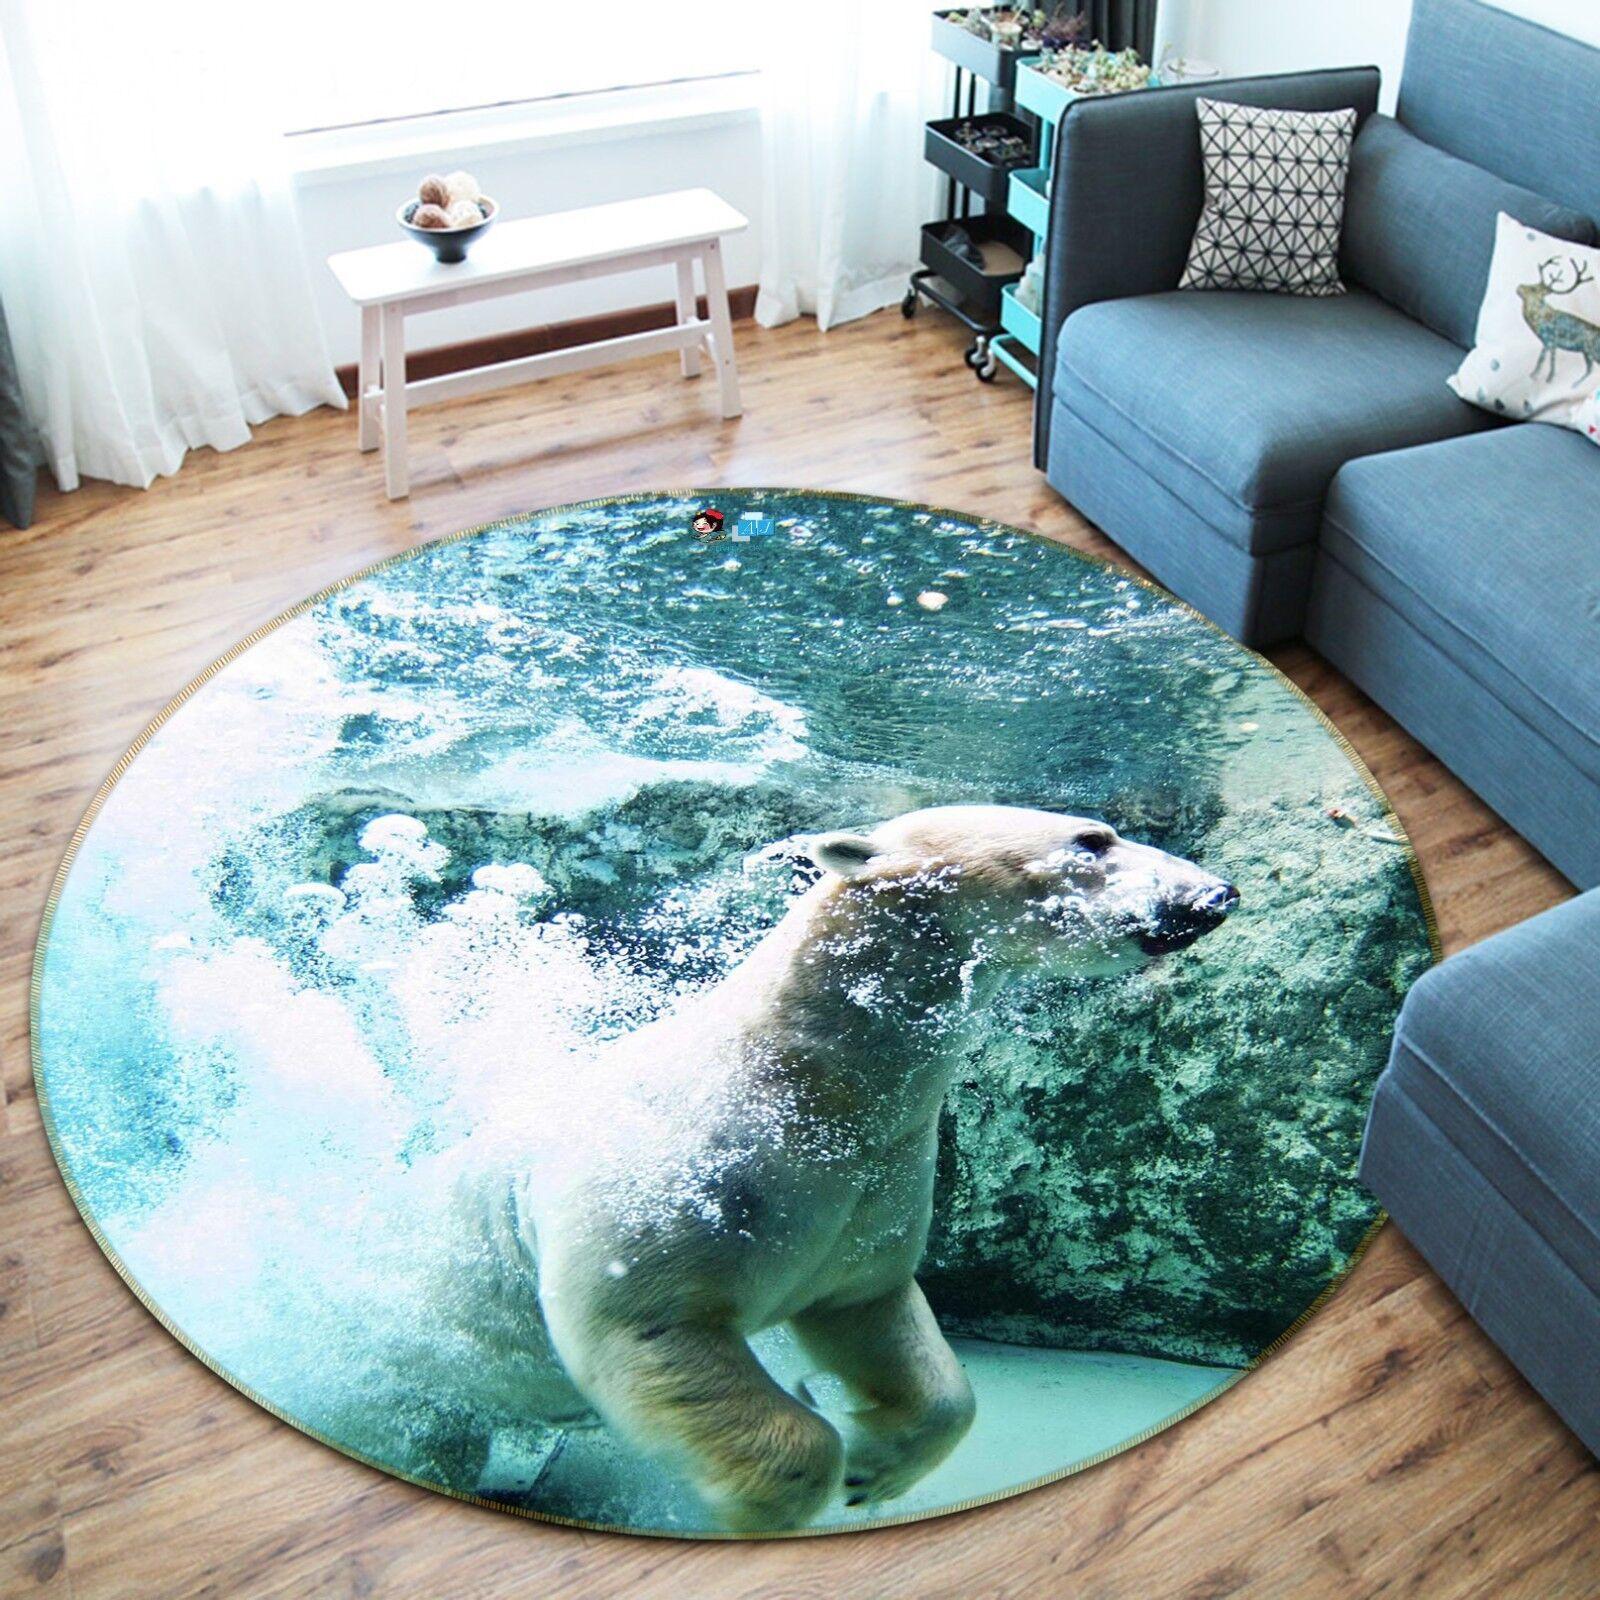 3d oso blancoa 38 antideslizante alfombra de maletero rondas elegante alfombra de